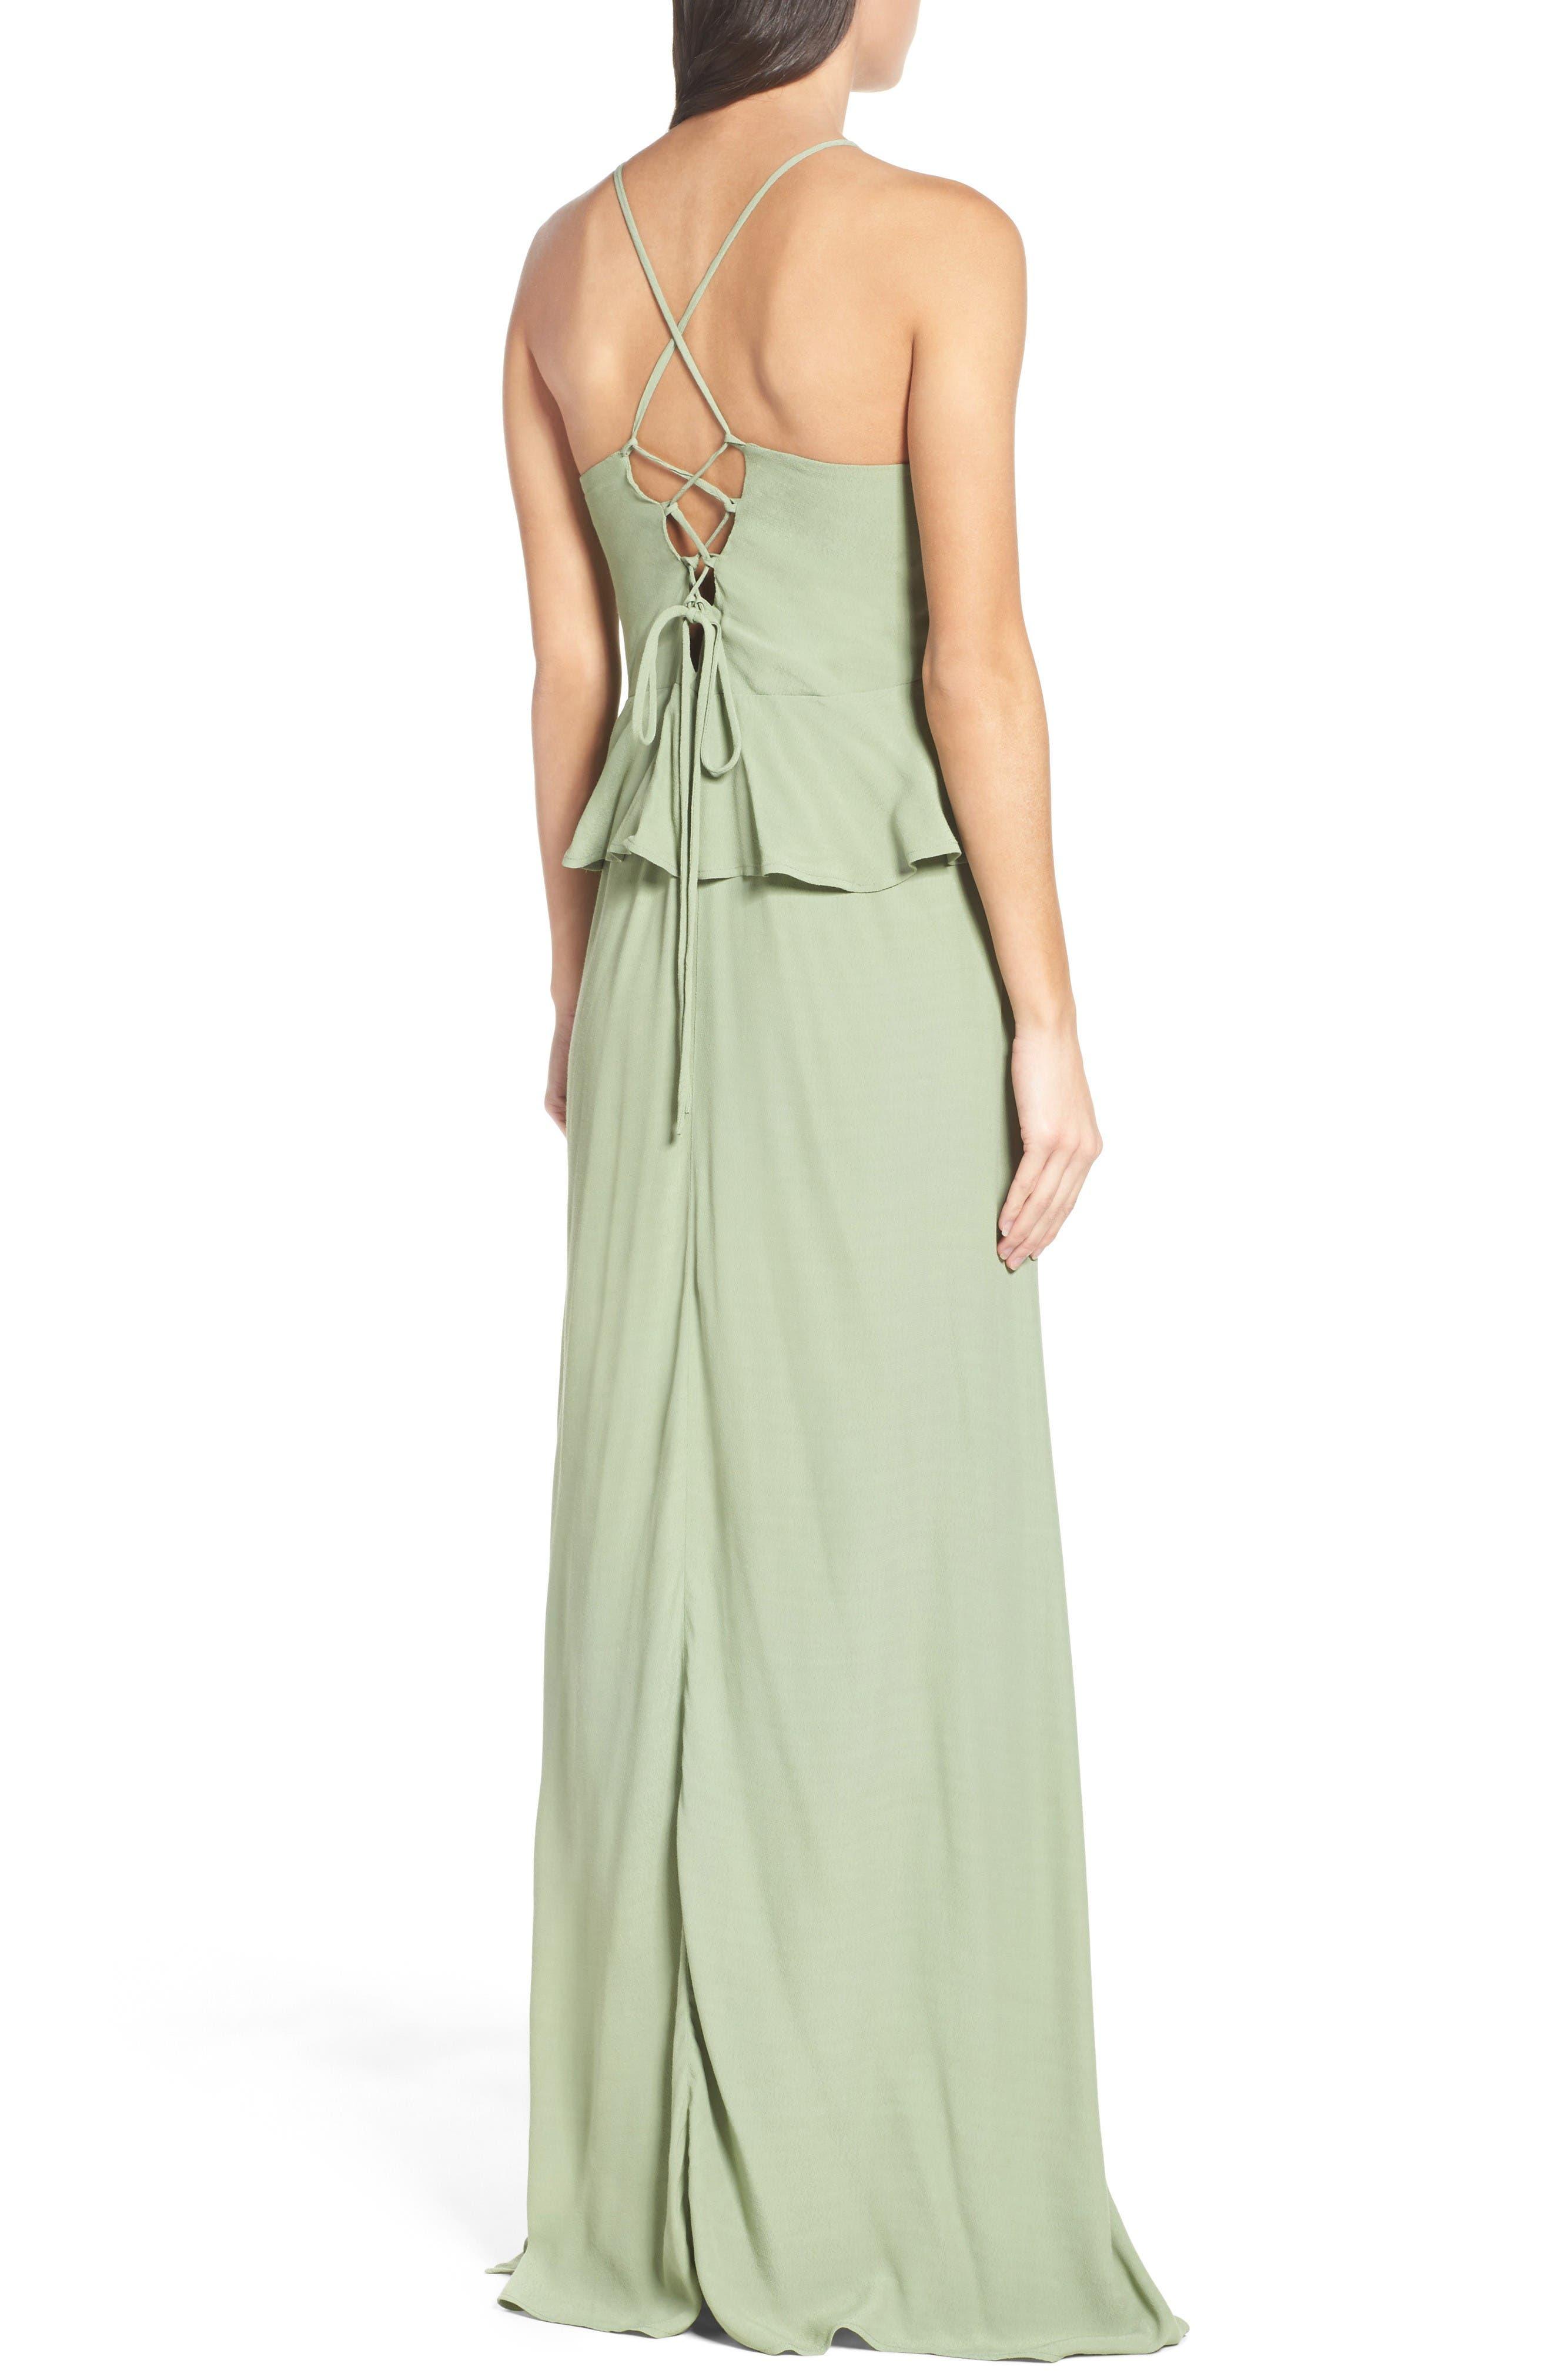 Roe + May Jolie Crepe Peplum Dress,                             Alternate thumbnail 2, color,                             Sage